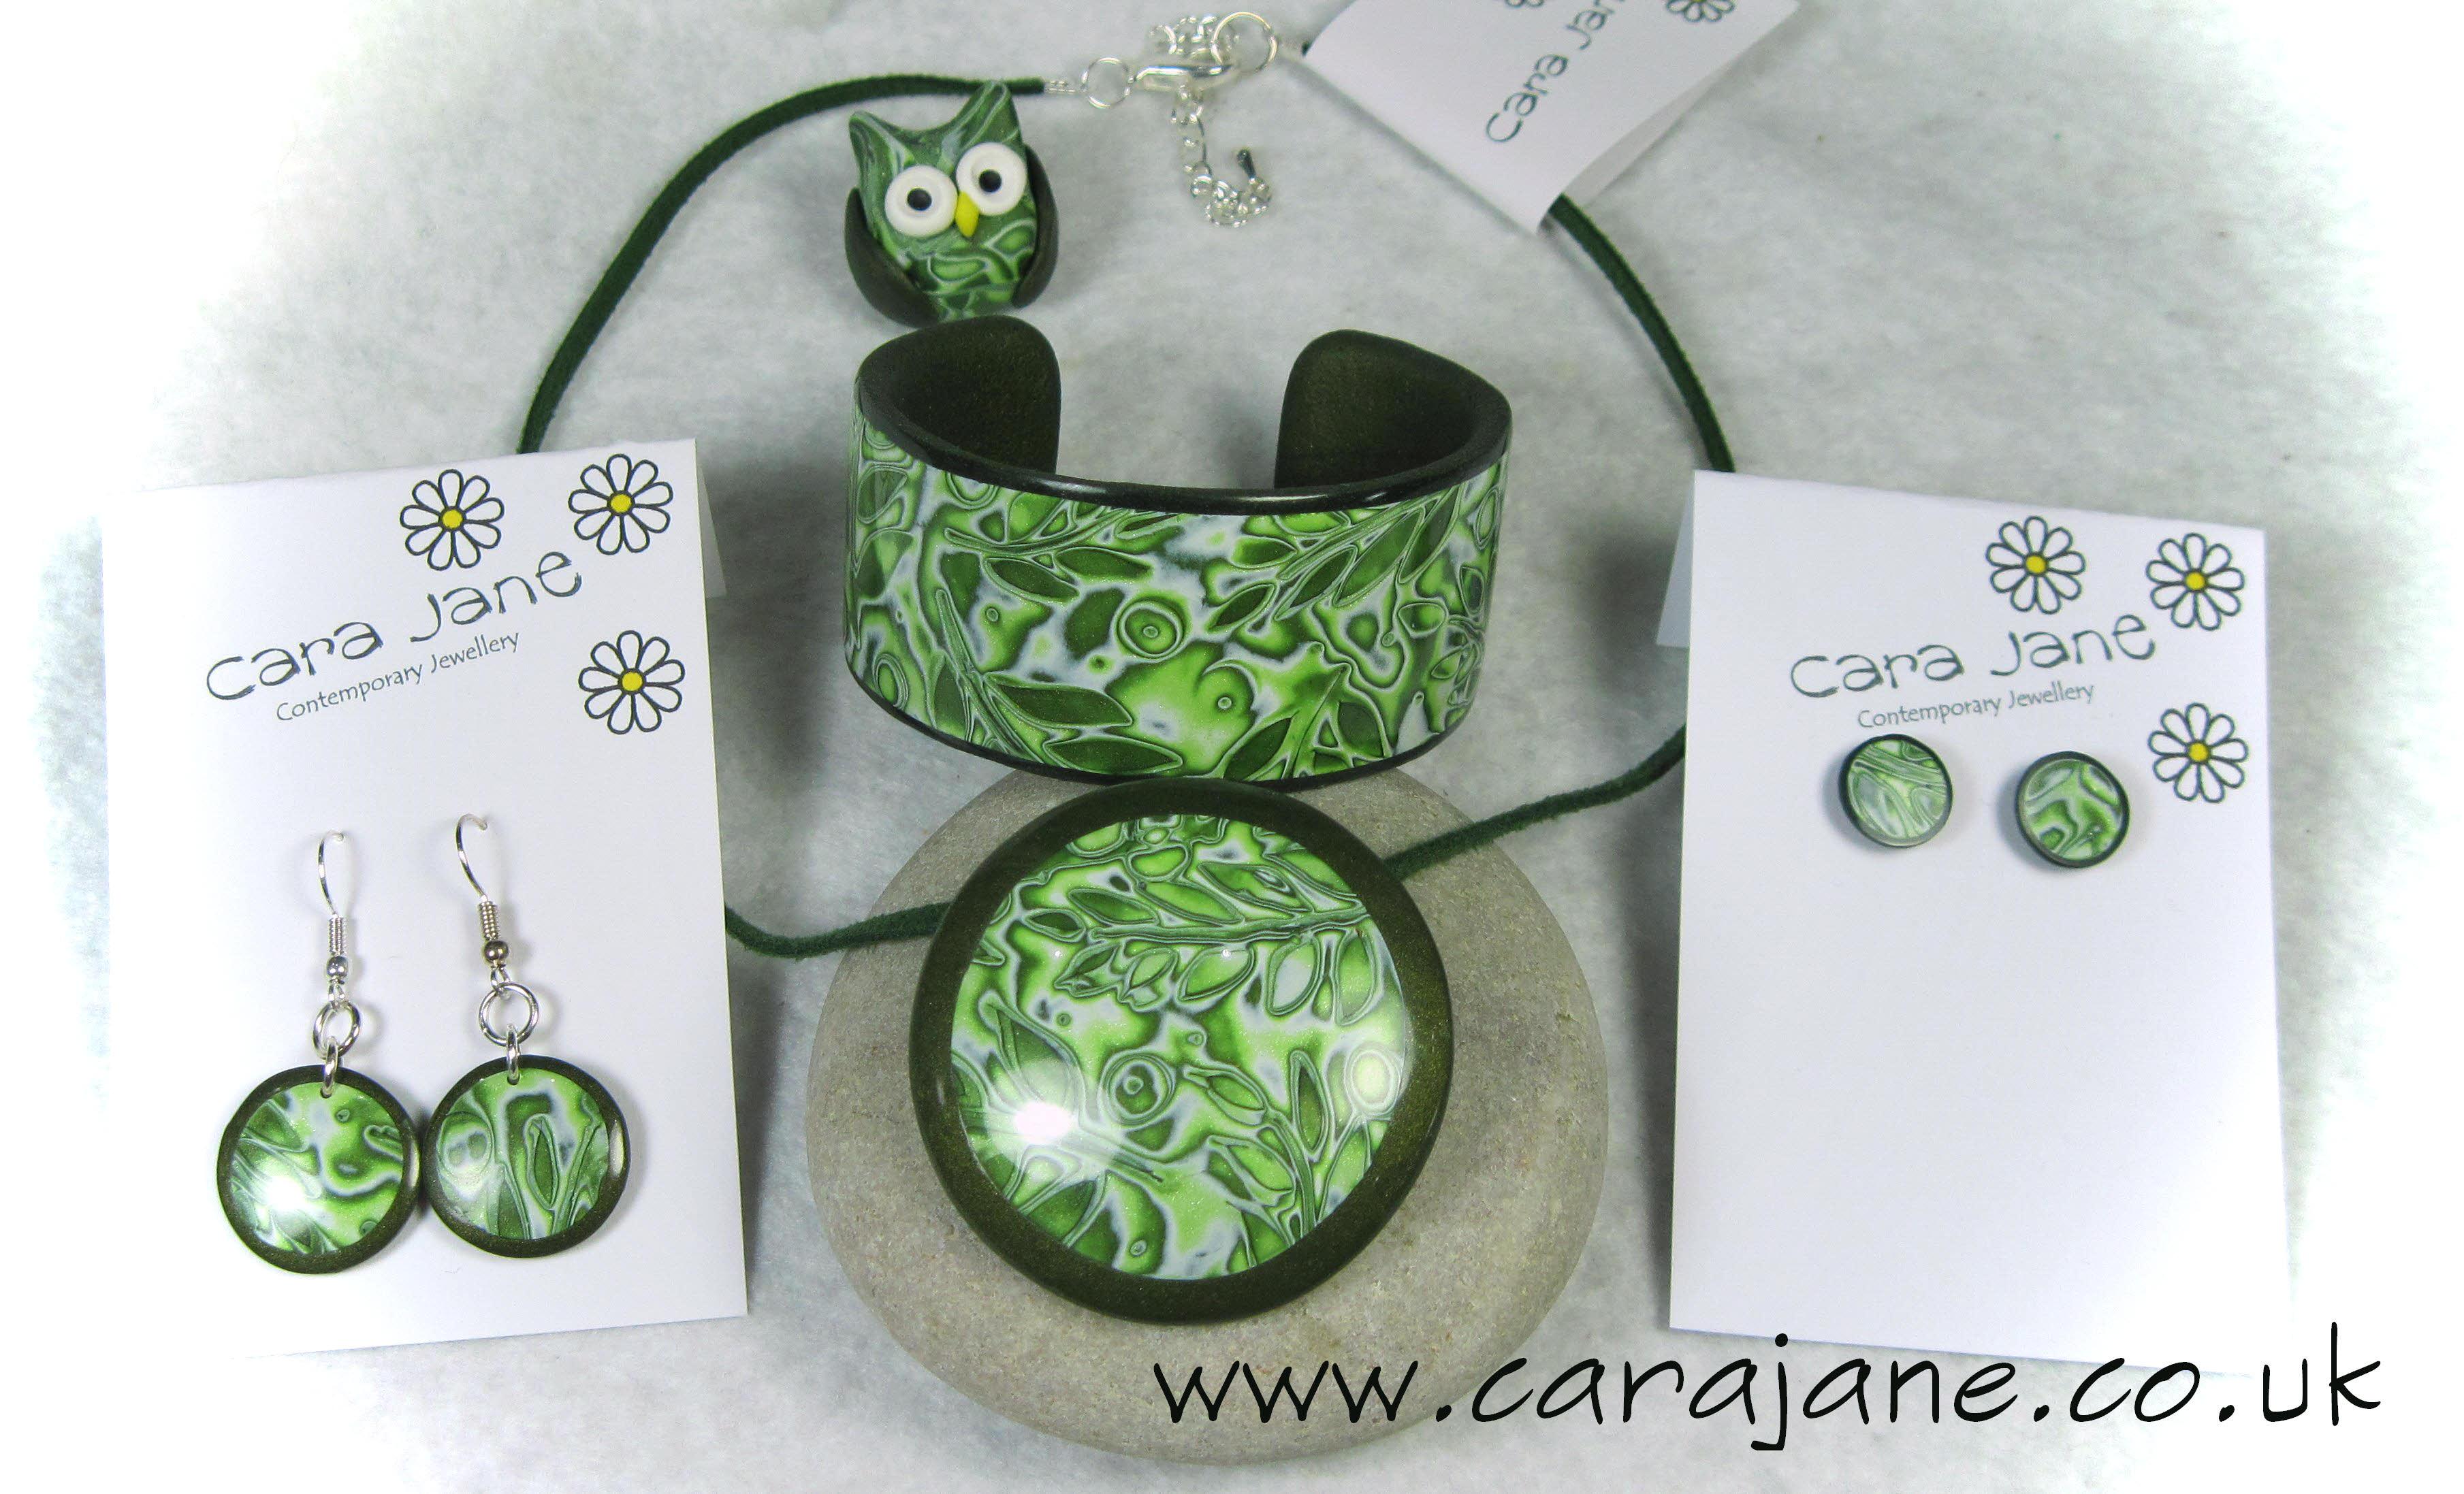 Green Mokume gane jewellery set